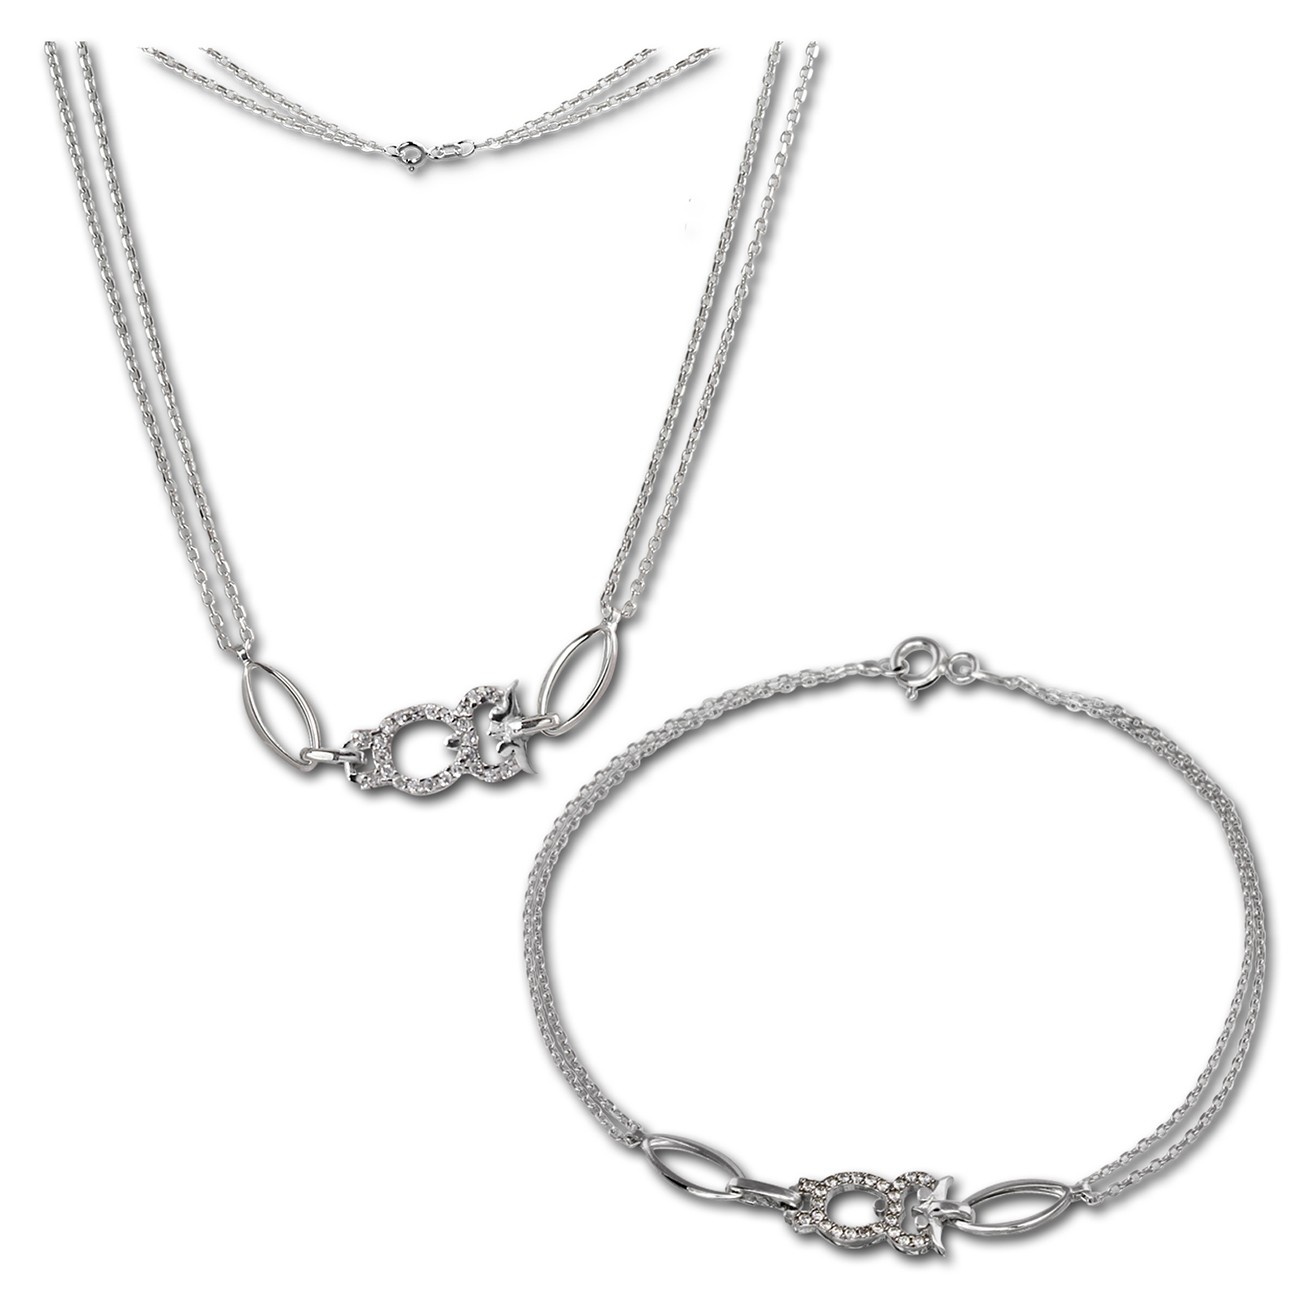 SilberDream Schmuckset Eule Zirkonia Kette & Armband 925 Silber SDS424W